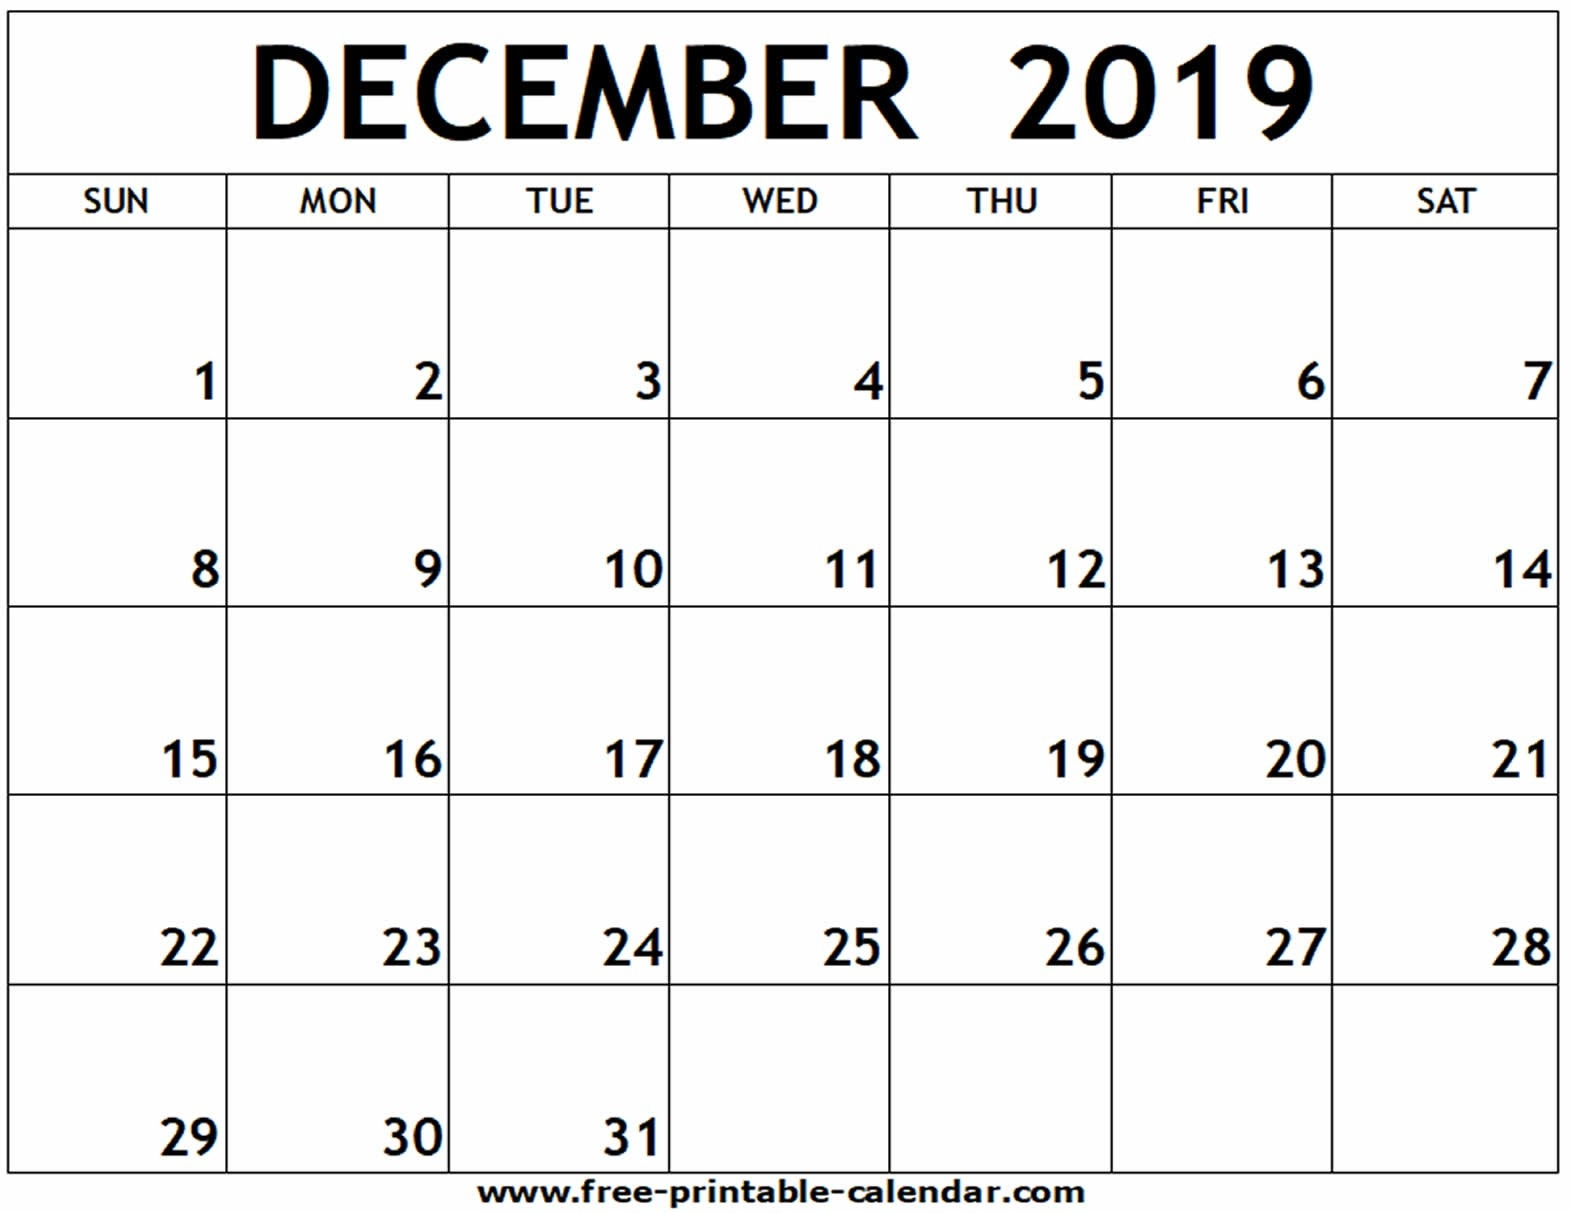 December 2019 Printable Calendar - Free-Printable-Calendar-December Canada Printable Calendar Free Monthly